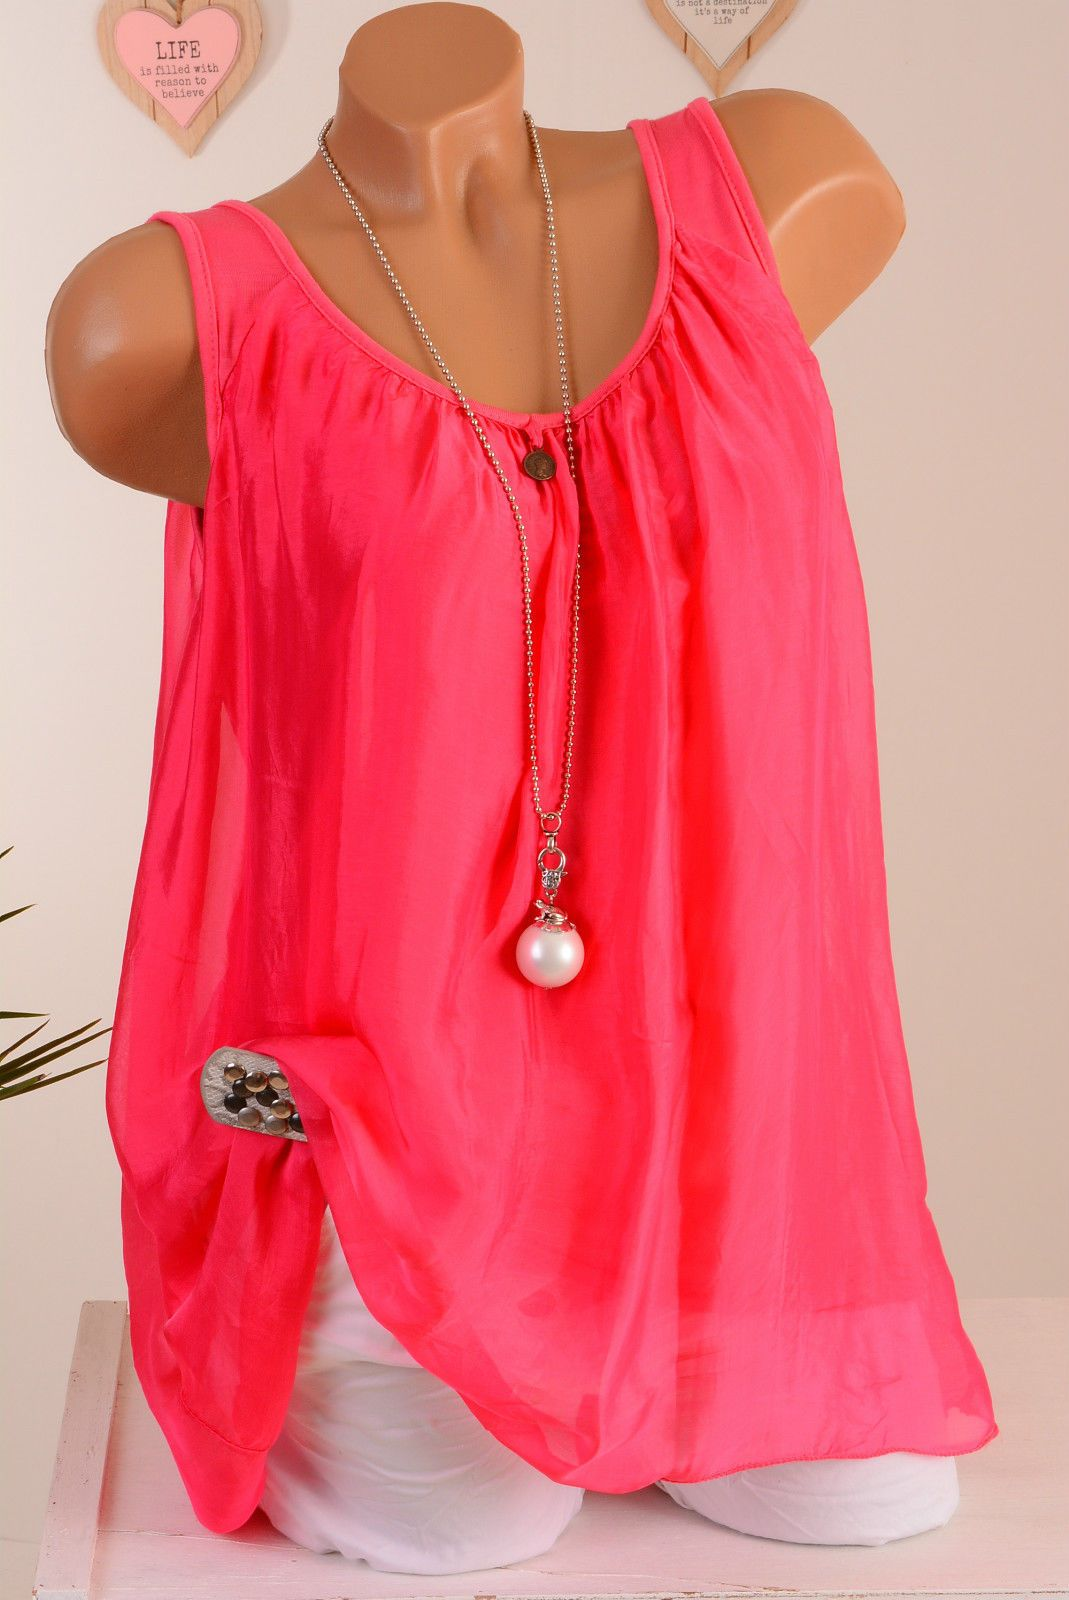 13a62d4914db08 38 40 42 TOP BLUSE TUNIKA 2lg ITALY Pink Koralle Seide Viskose Sommer NEU    eBay